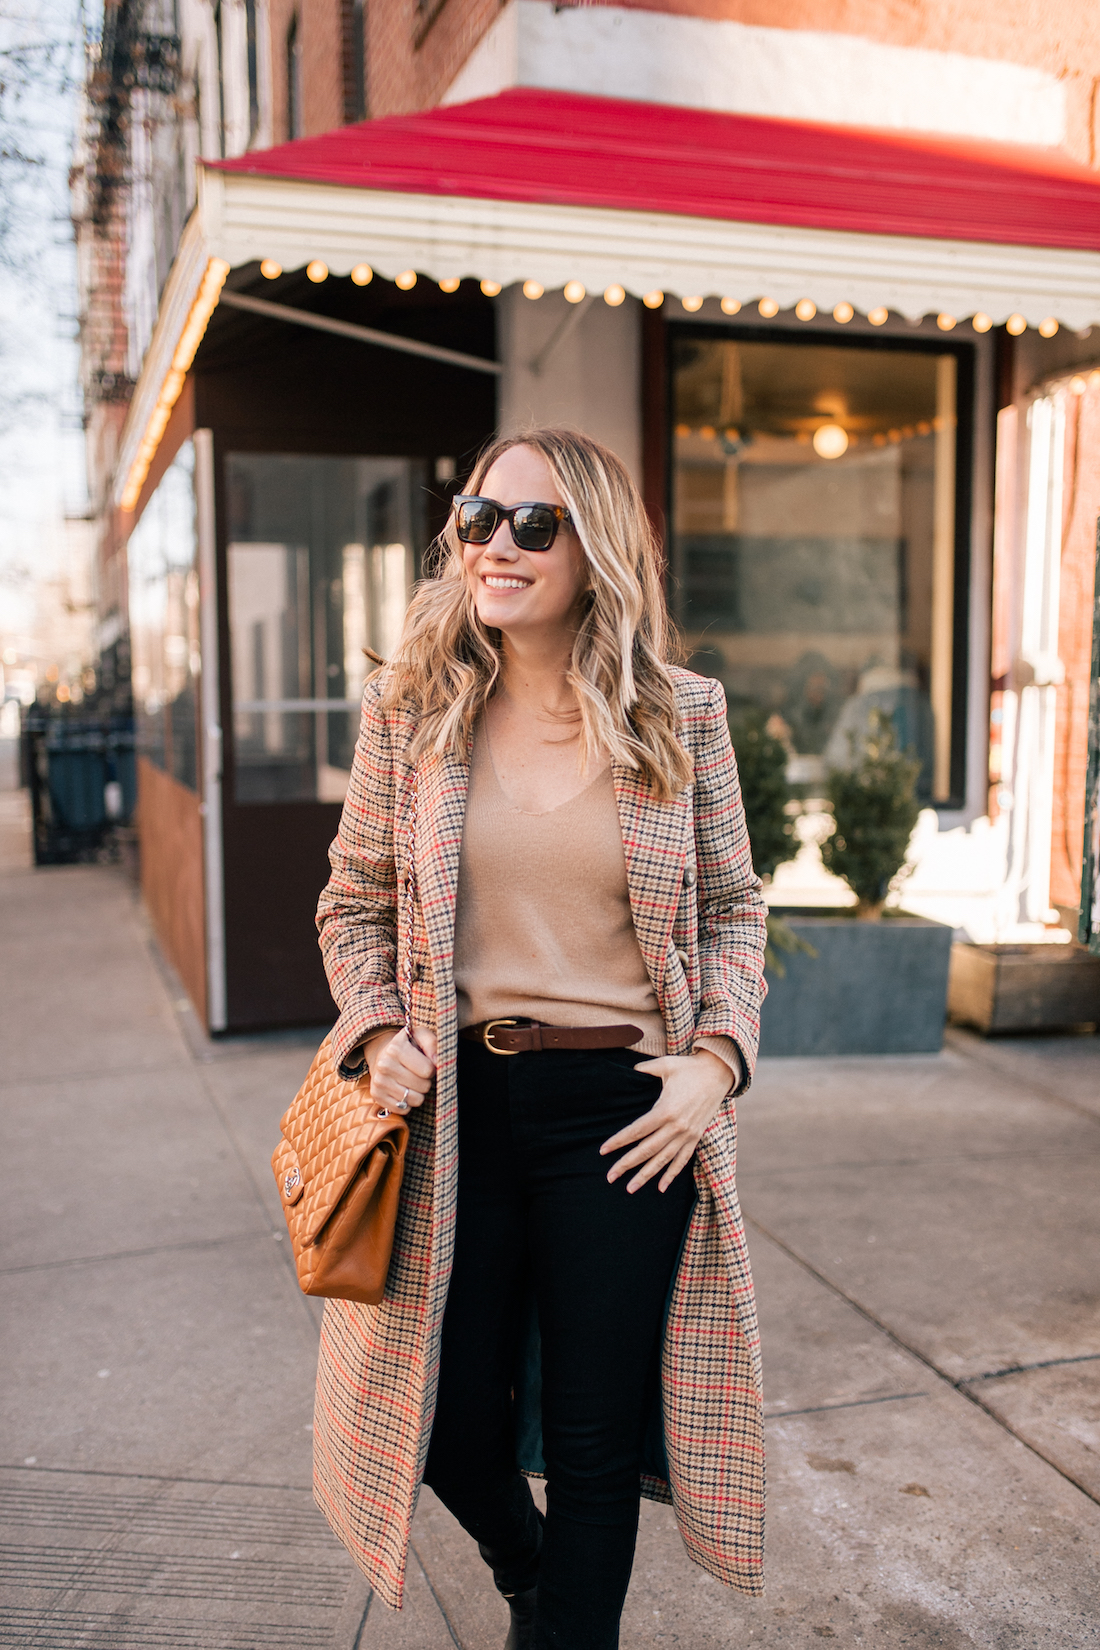 Grace Atwood Outfit Details:Topshop Coat // Theory Cashmere Sweater // Paige Jeans // Celine Sunglasses // J.Crew Belt // Chanel Purse